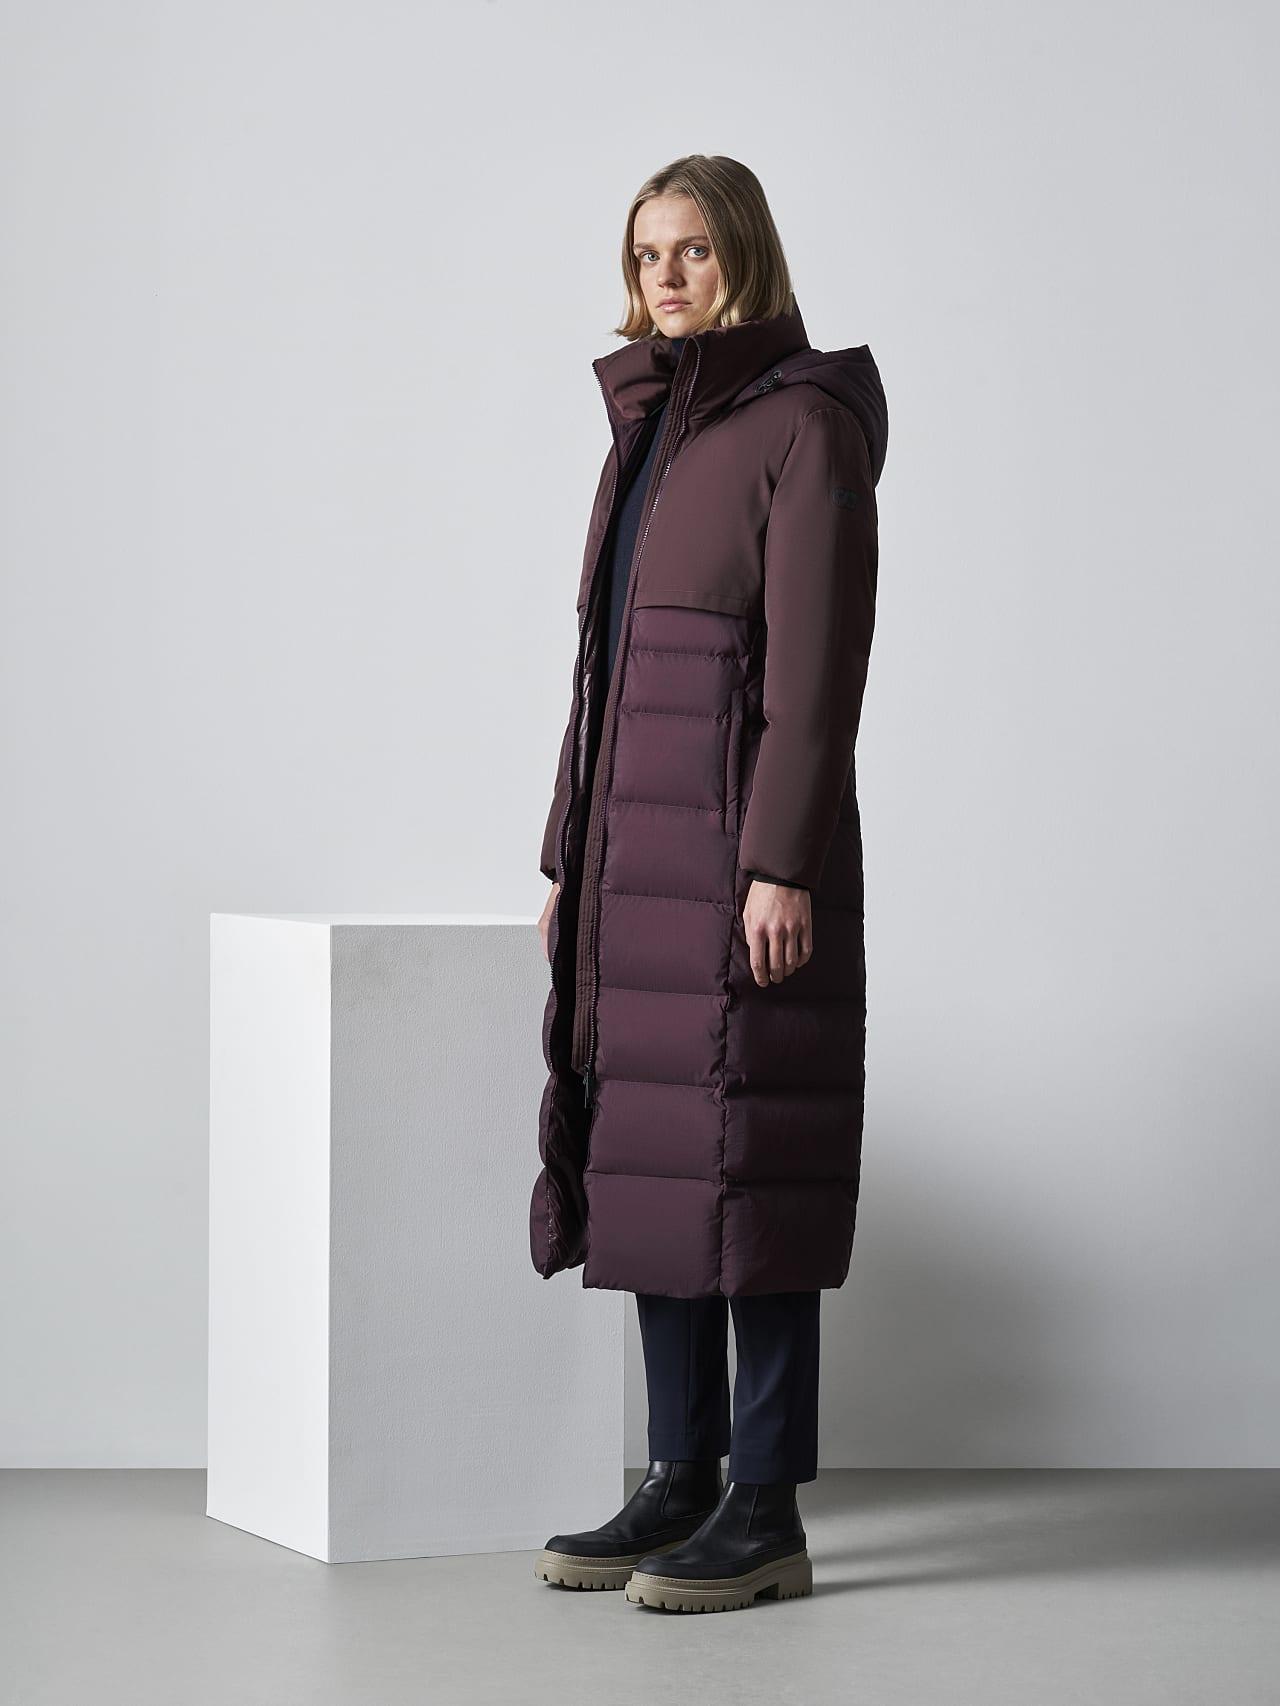 OMONA V1.Y5.02 PrimaLoft® Maxi Puffer Coat Burgundy Front Alpha Tauri